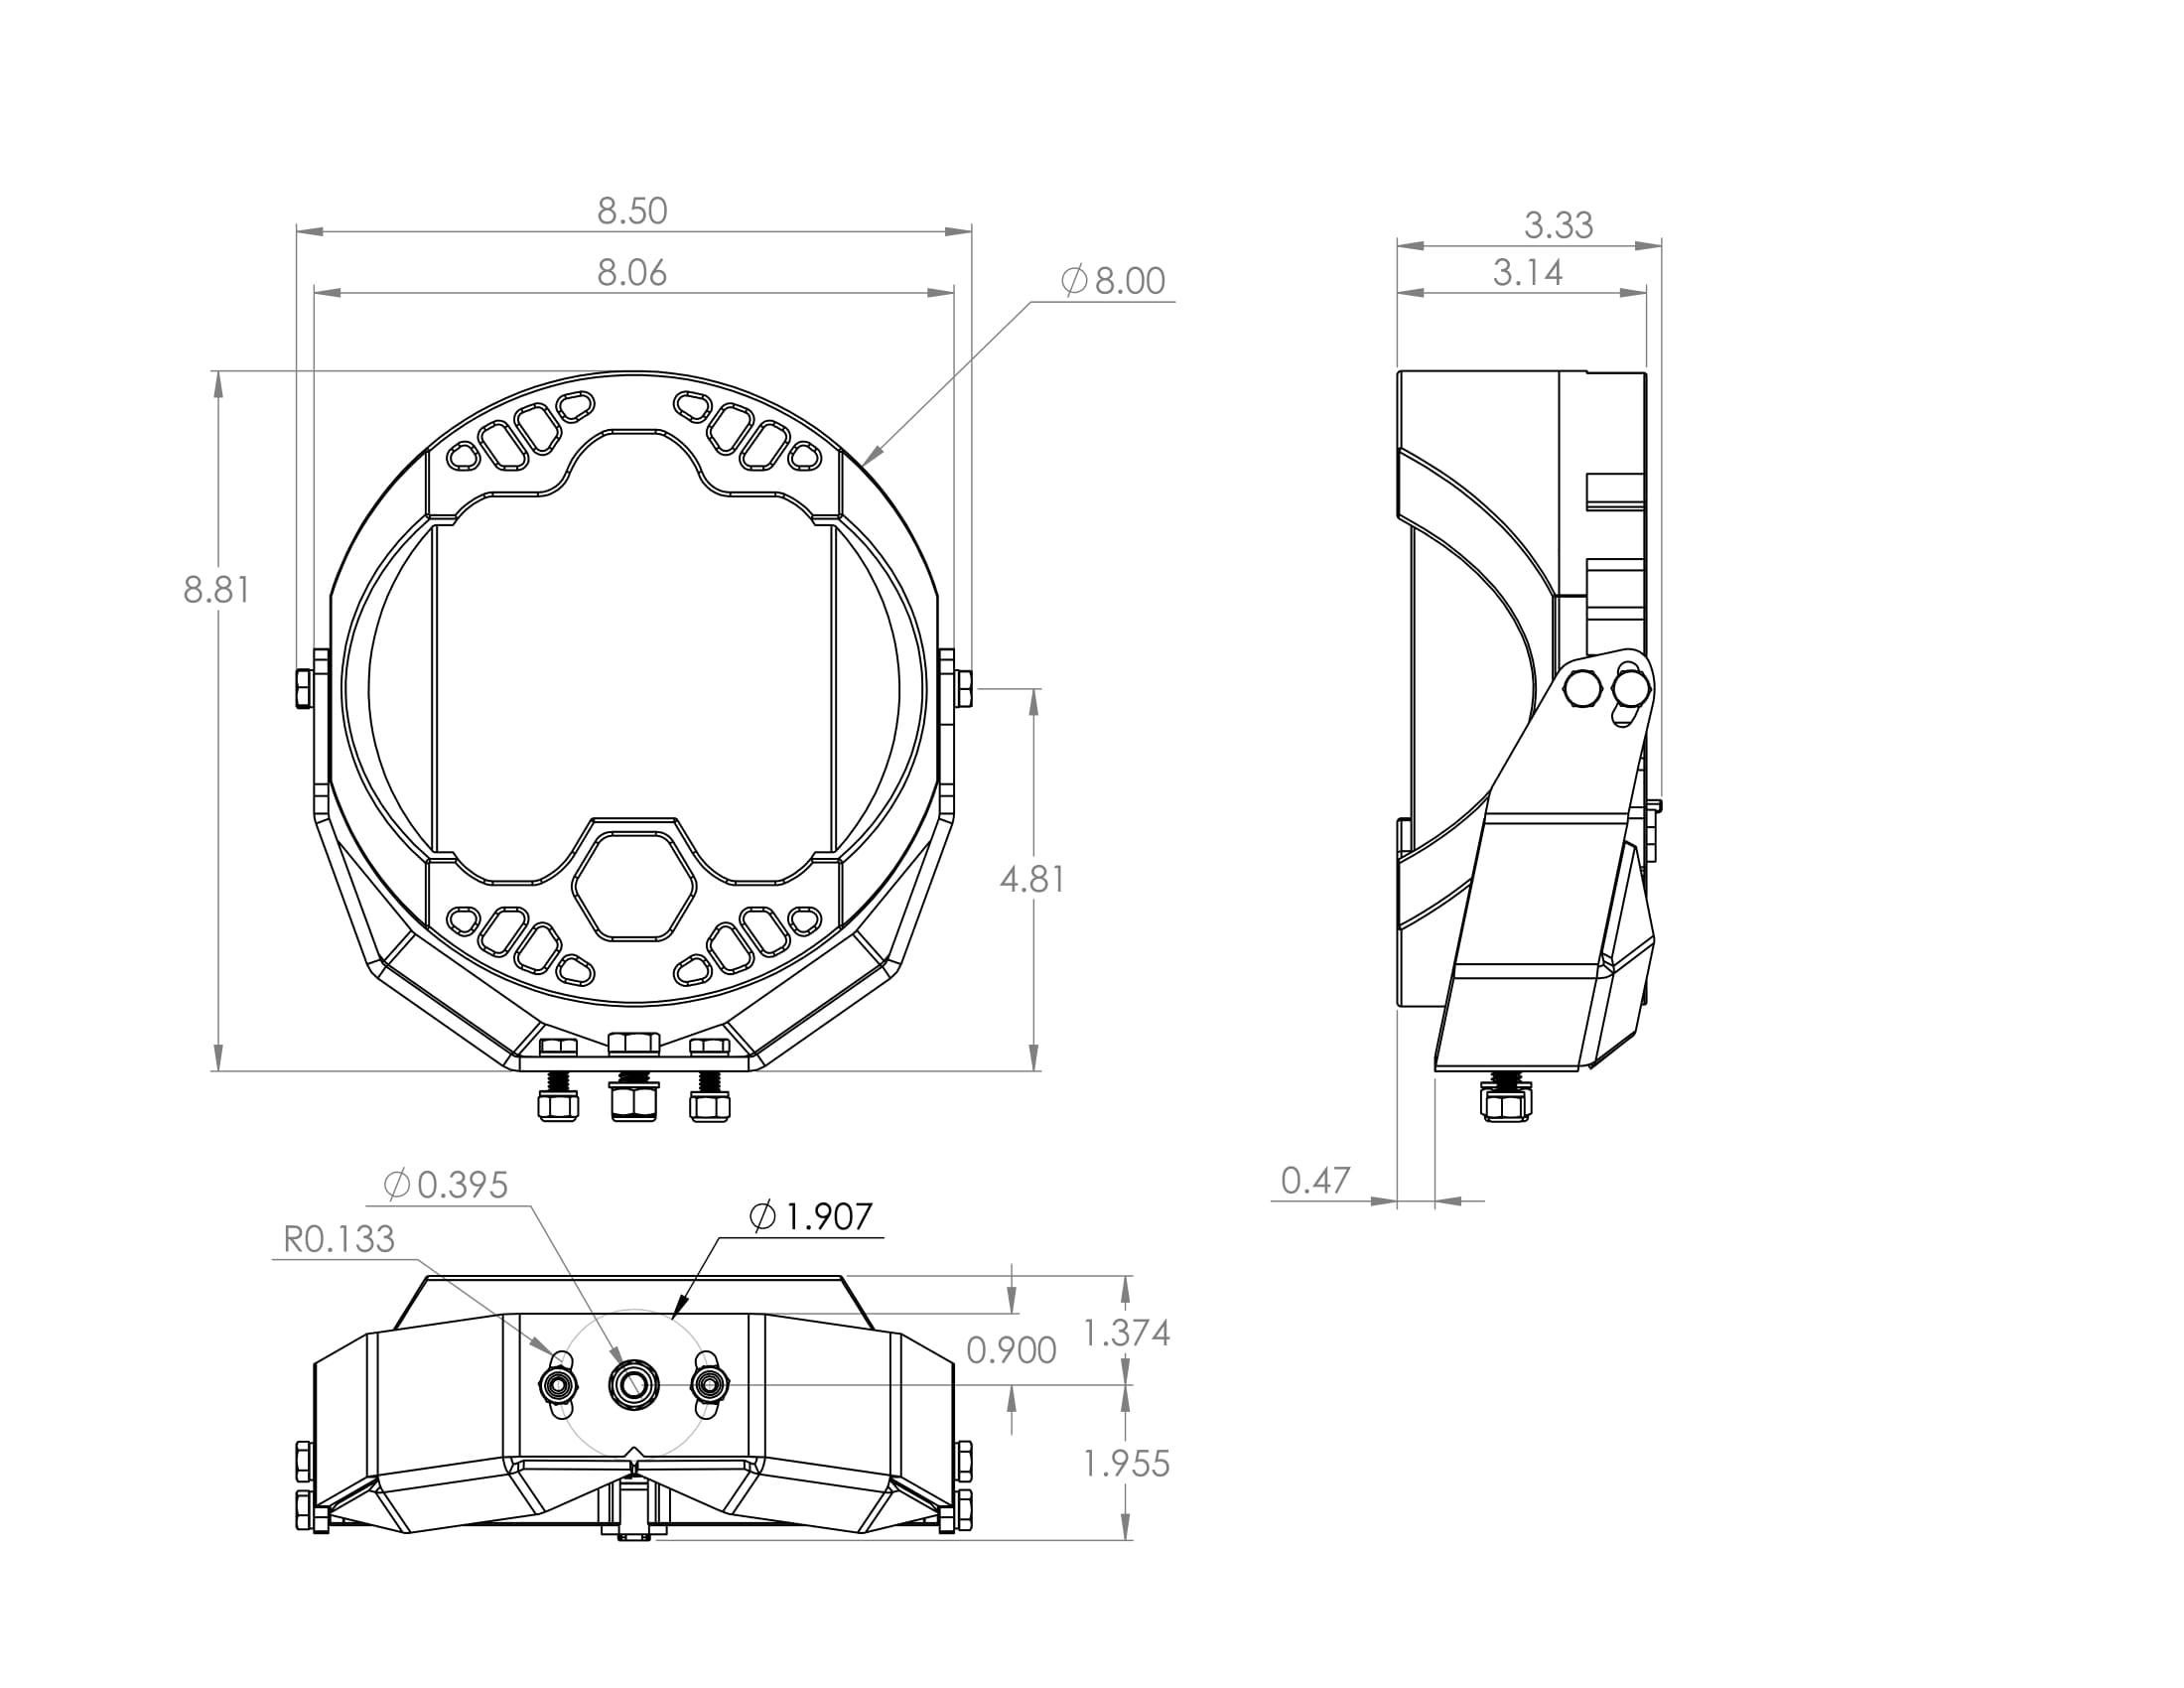 Totalzparts Baja Designs Lp9 Sport Led Driving Combo Light 350003 Nissan Datsun 300zx Turbo Exhaust Diagram Category